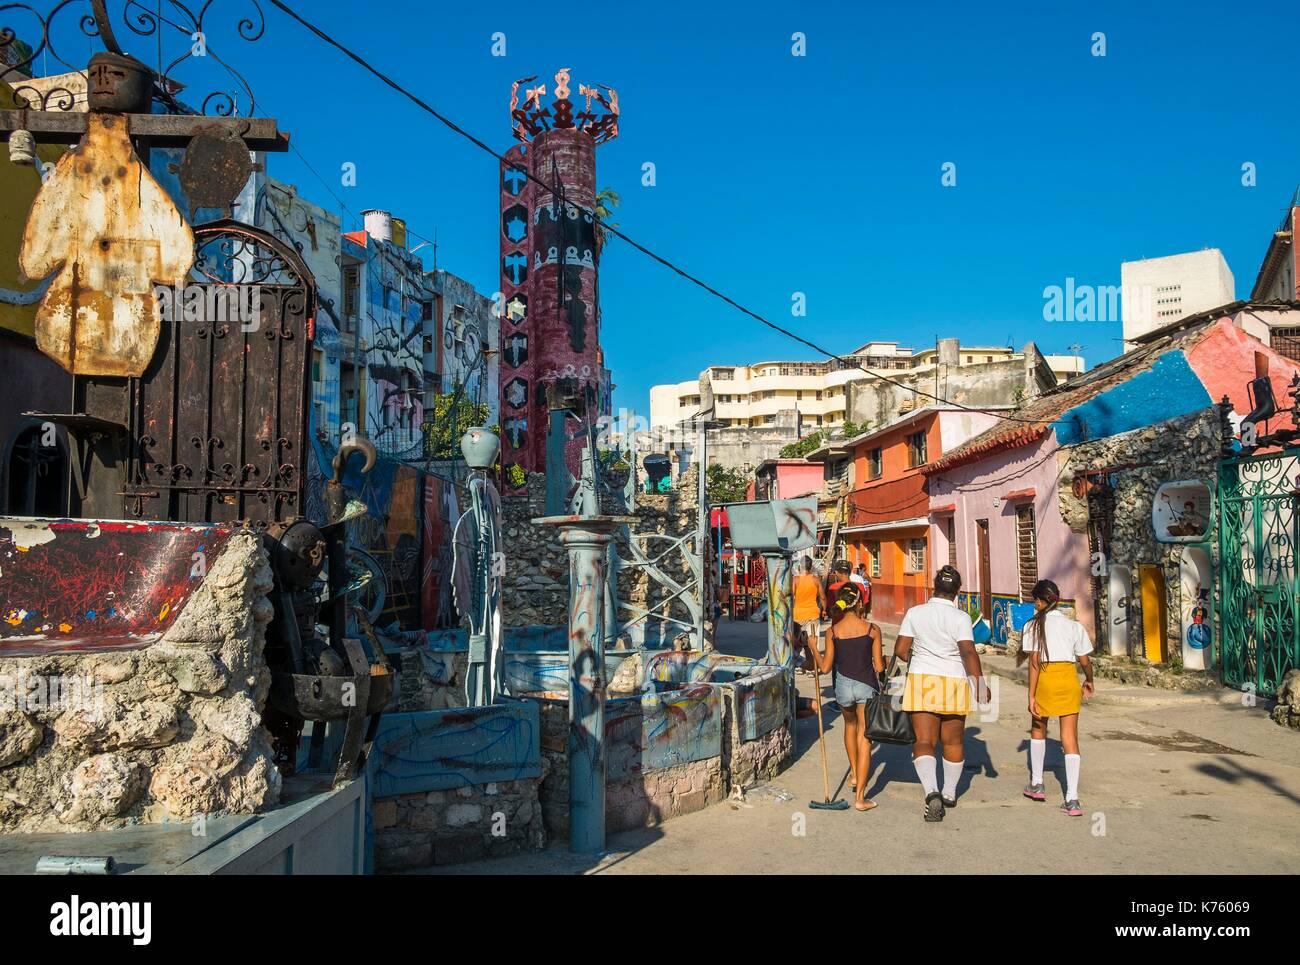 Cuba, Havana, Centro Habana district, Callejon de Hamel is